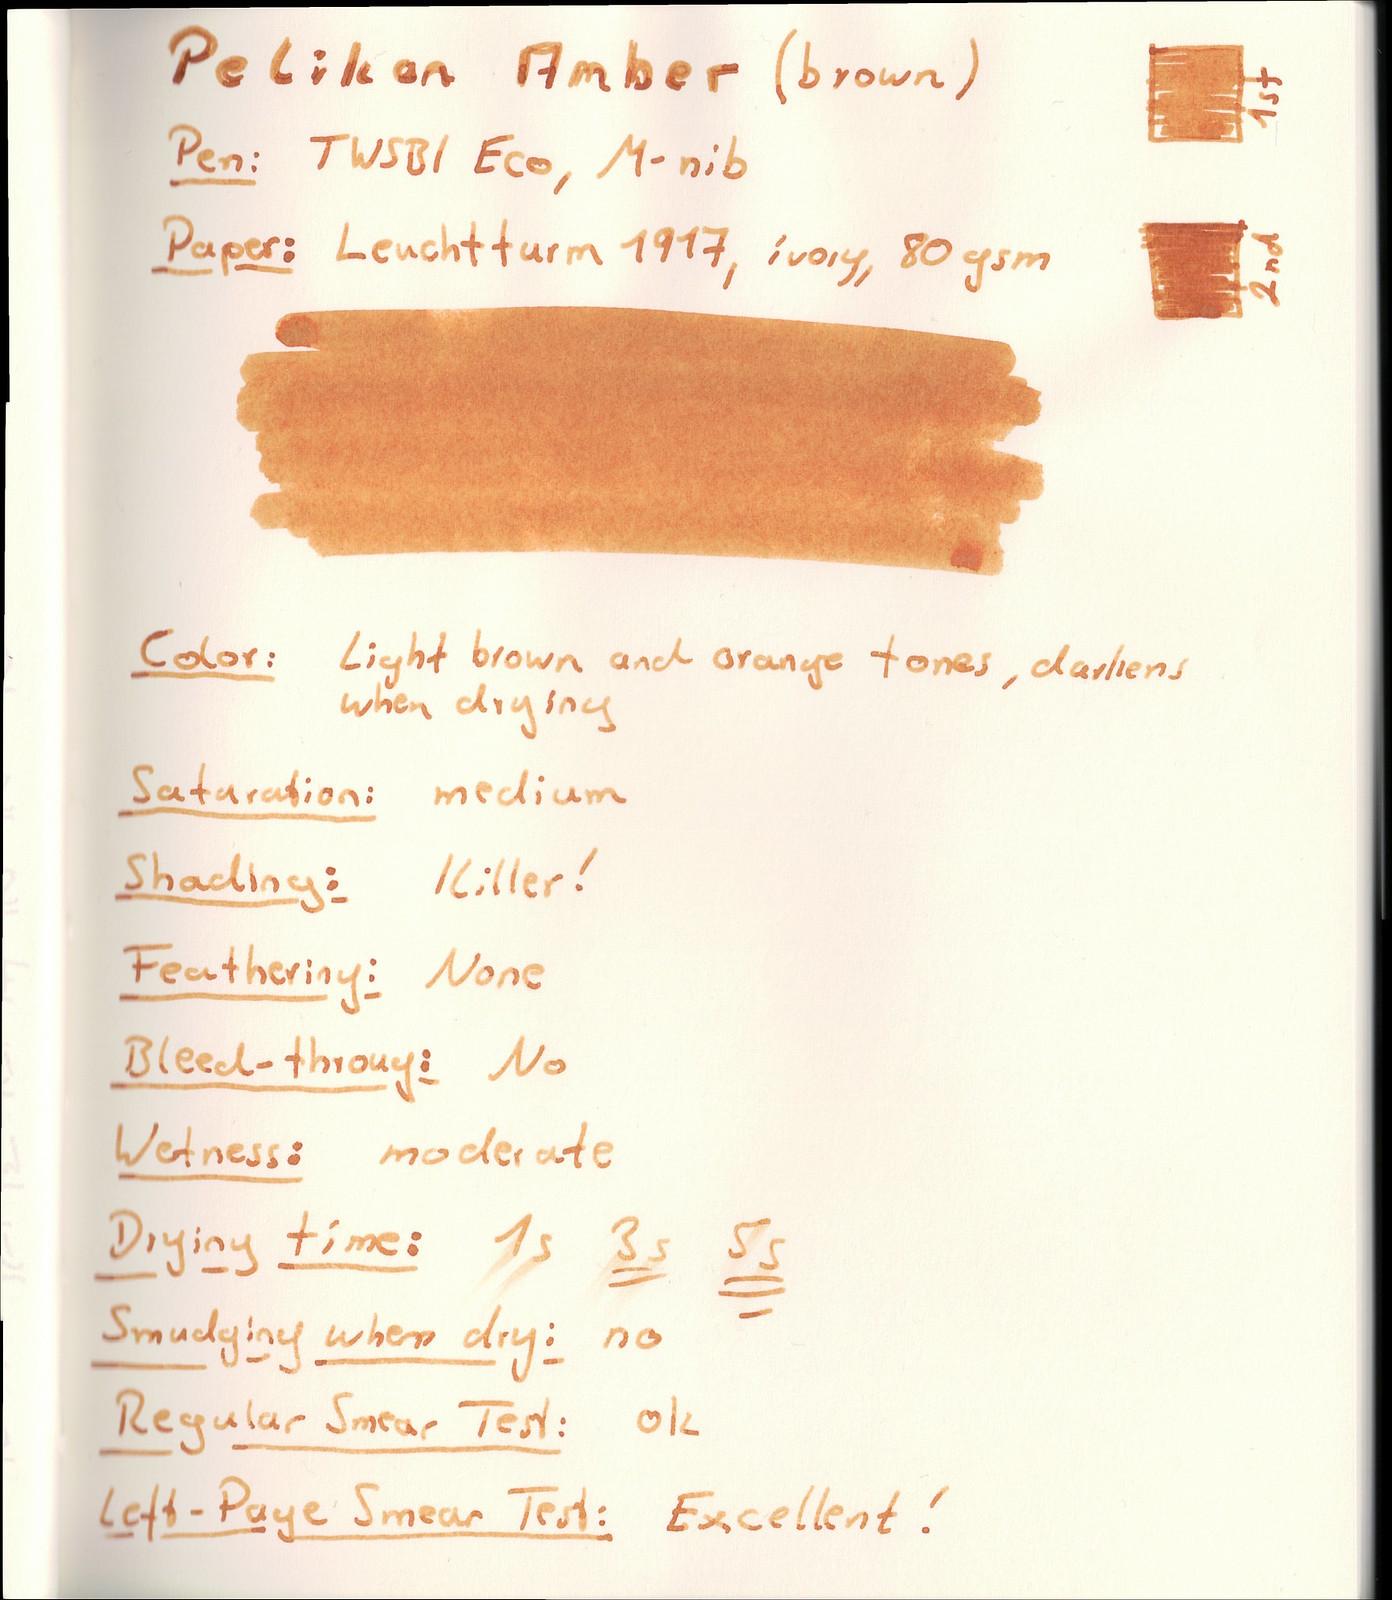 Pelikan Amber on Leuchtturm paper